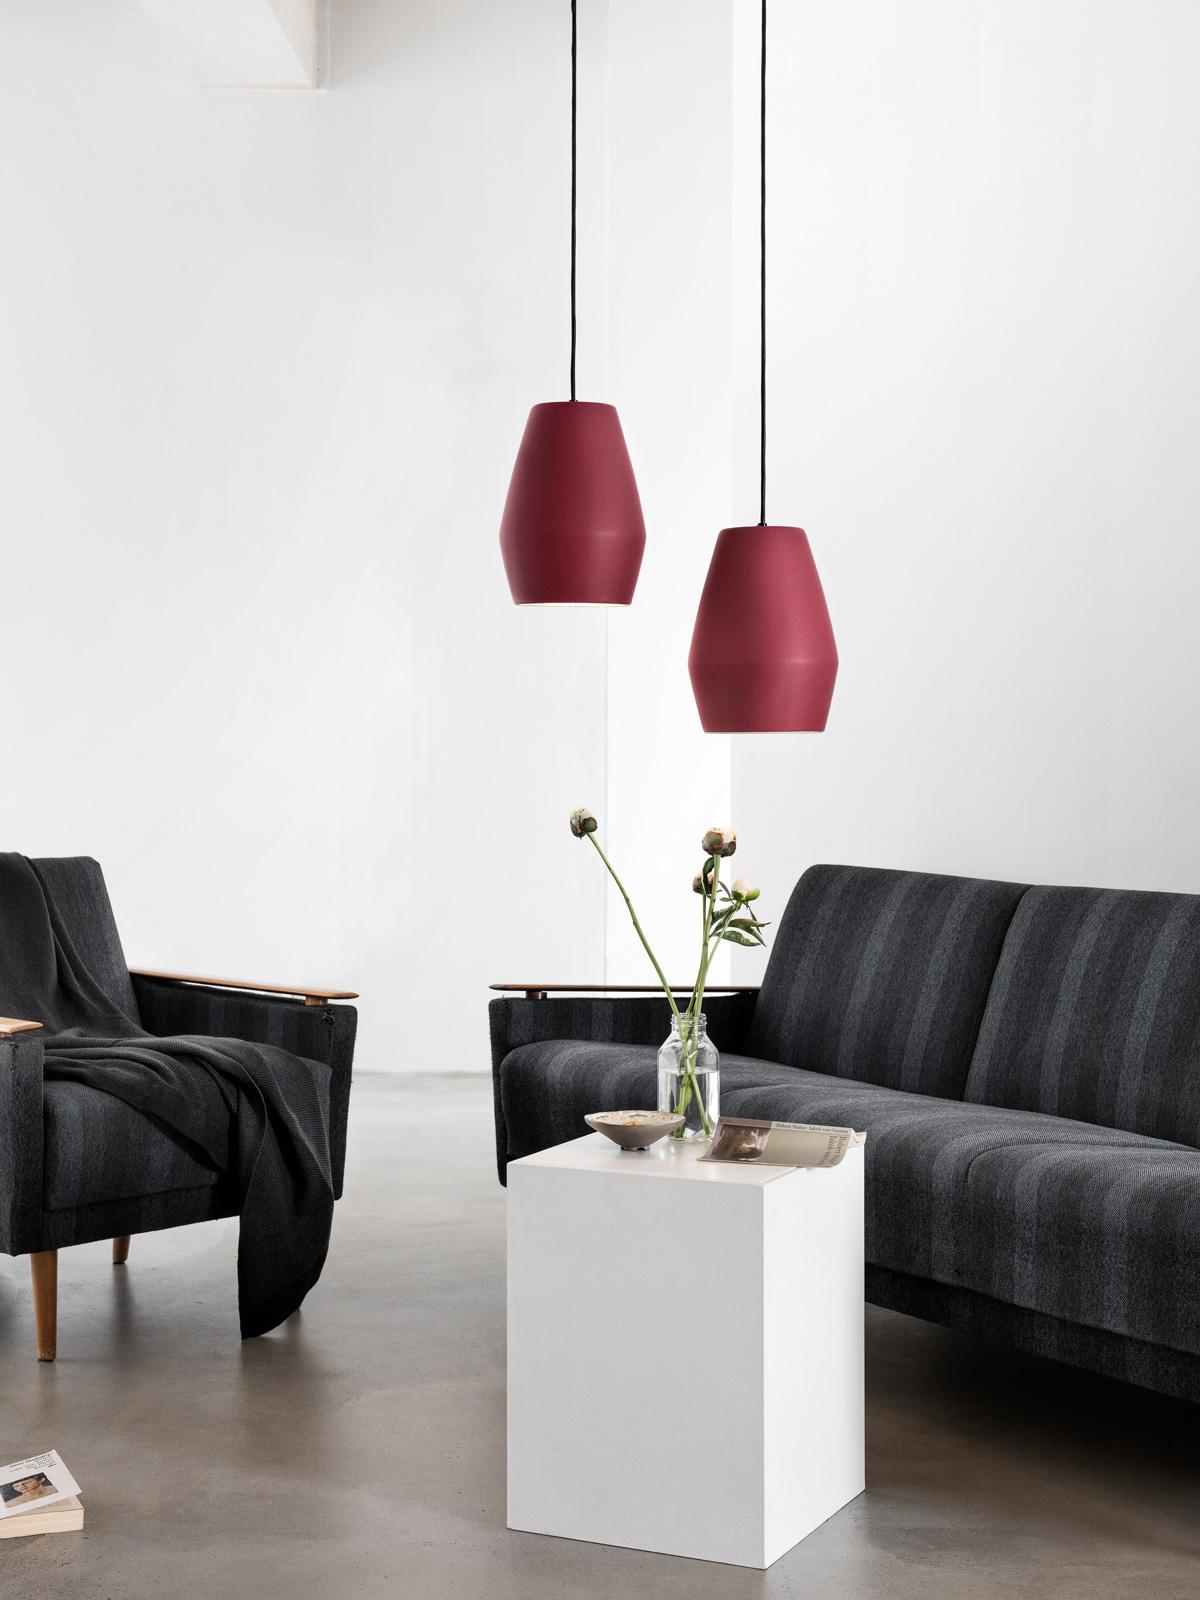 DesignOrt Lampen Blog: Bell - Glockenförmige Designerleuchten